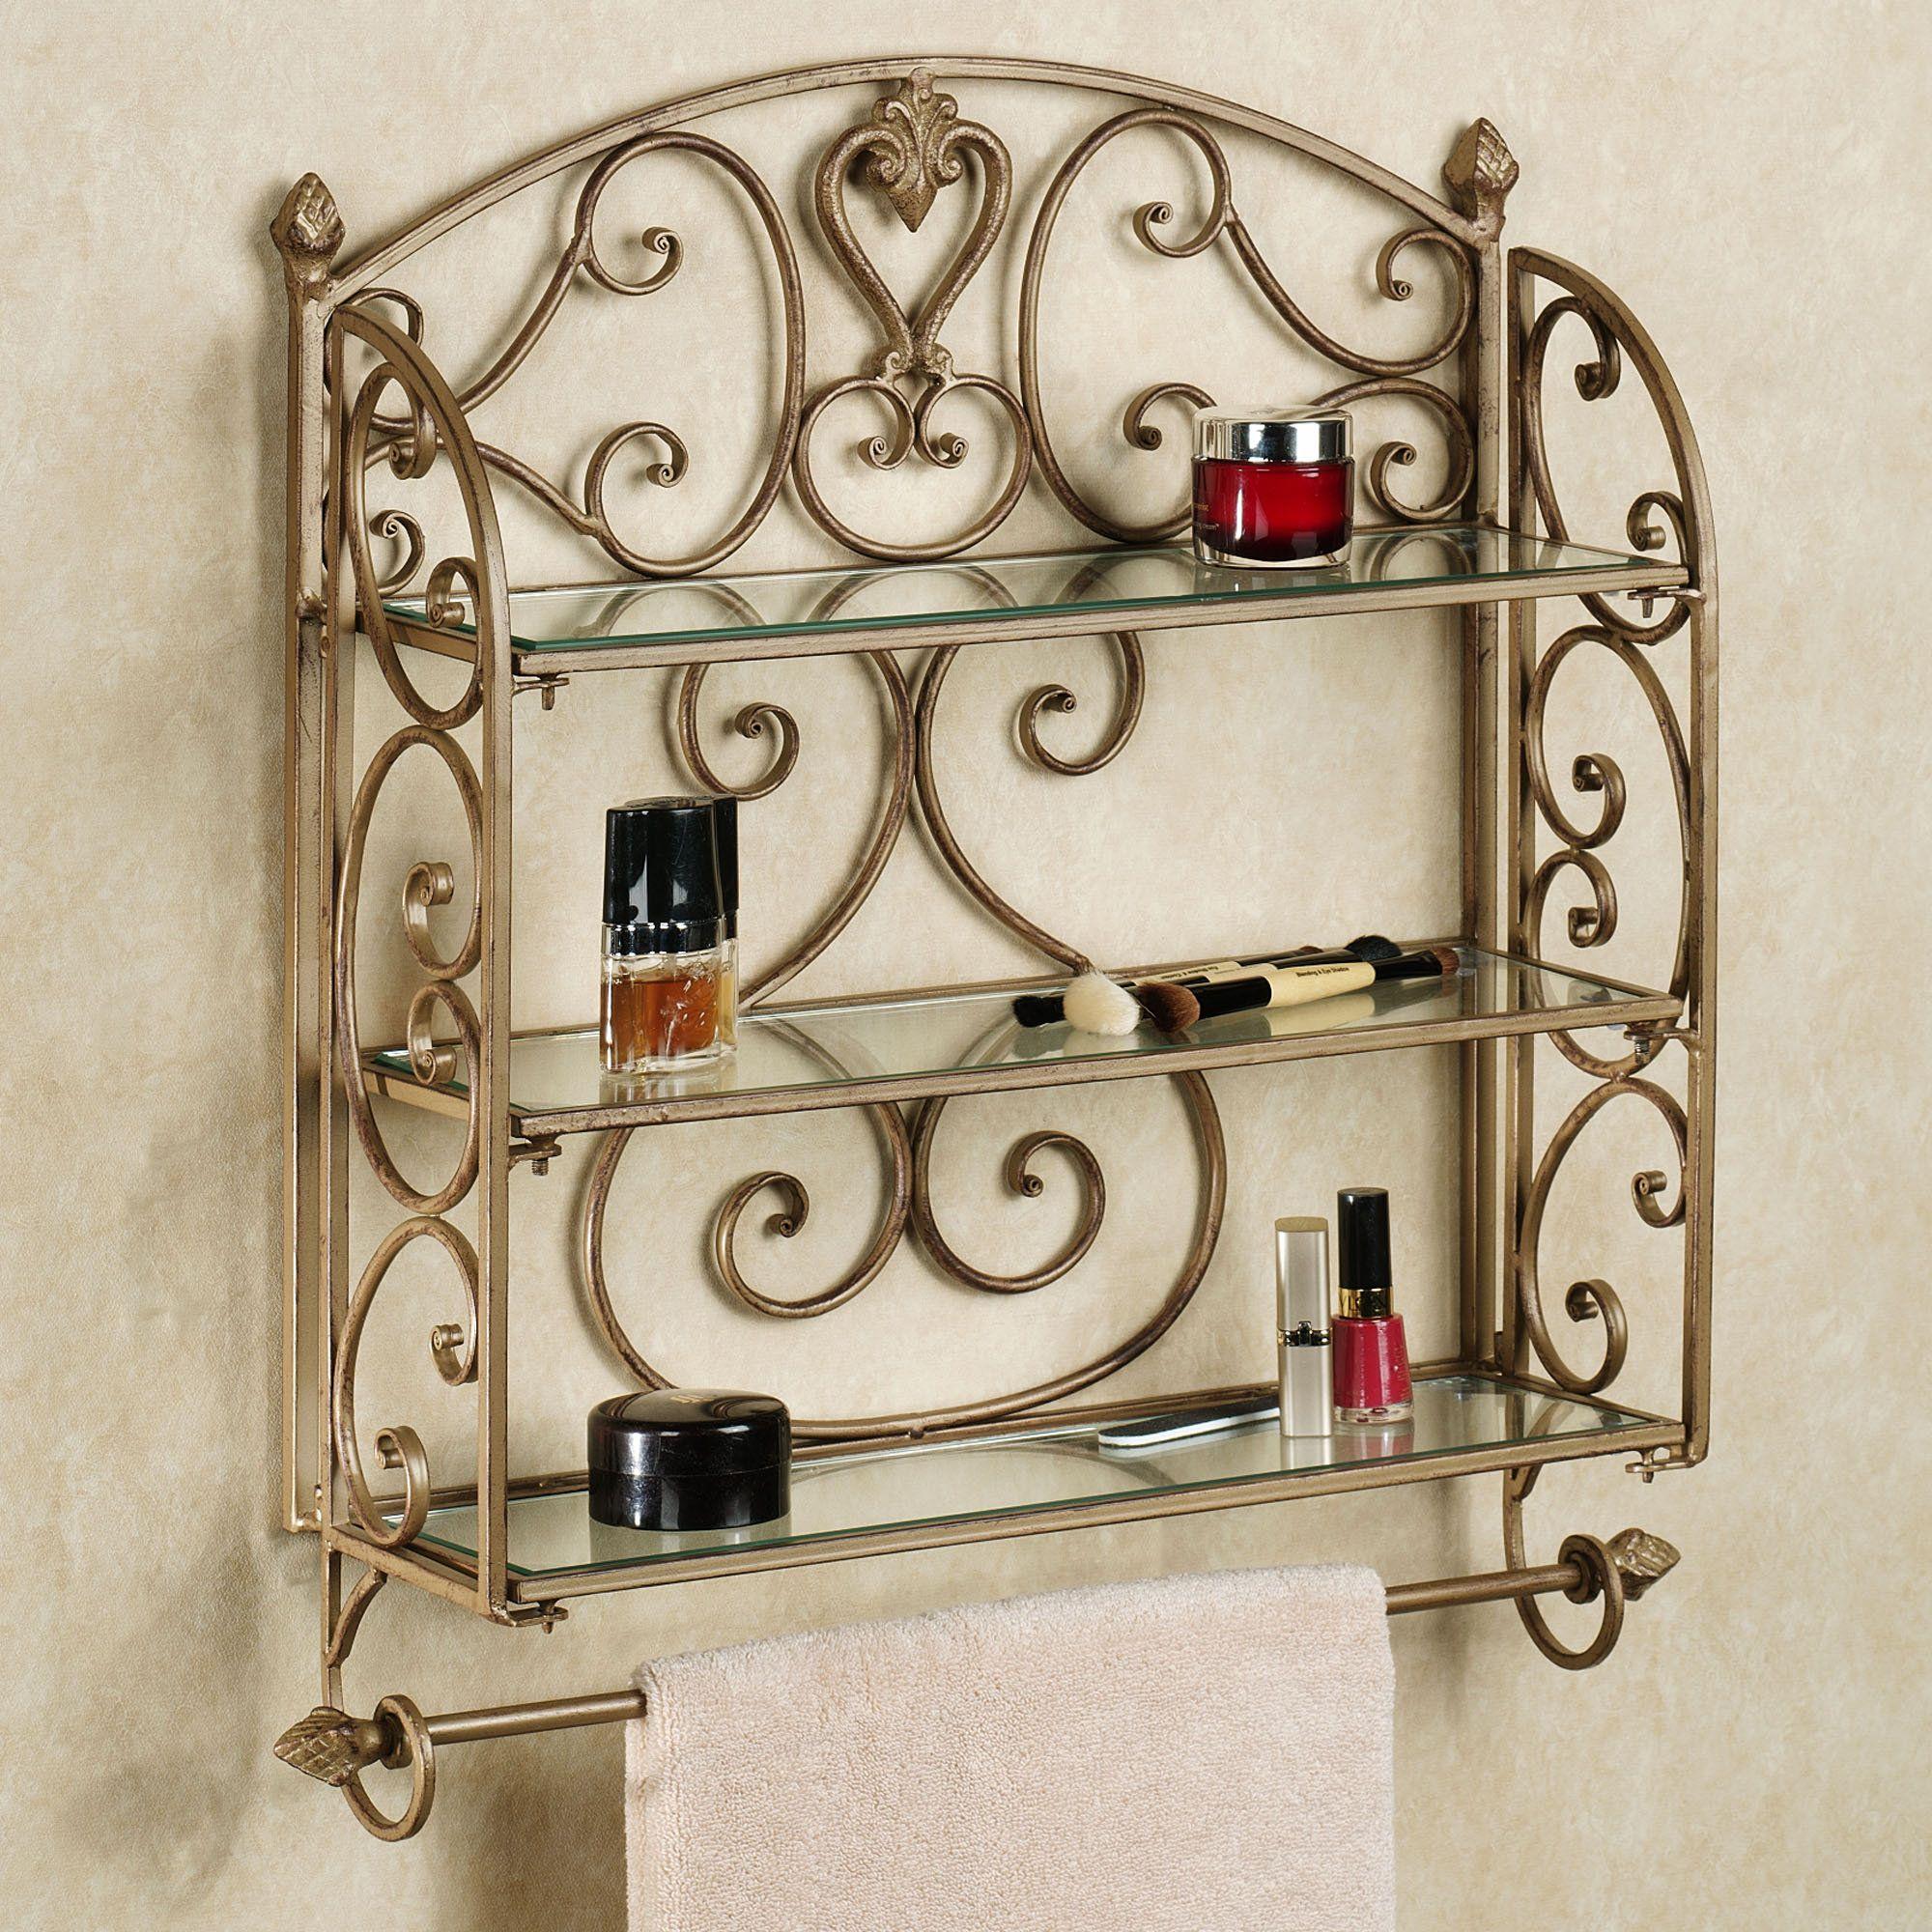 Aldabella Satin Gold Wall Shelf Towel Bar | Gold walls, Towels and ...